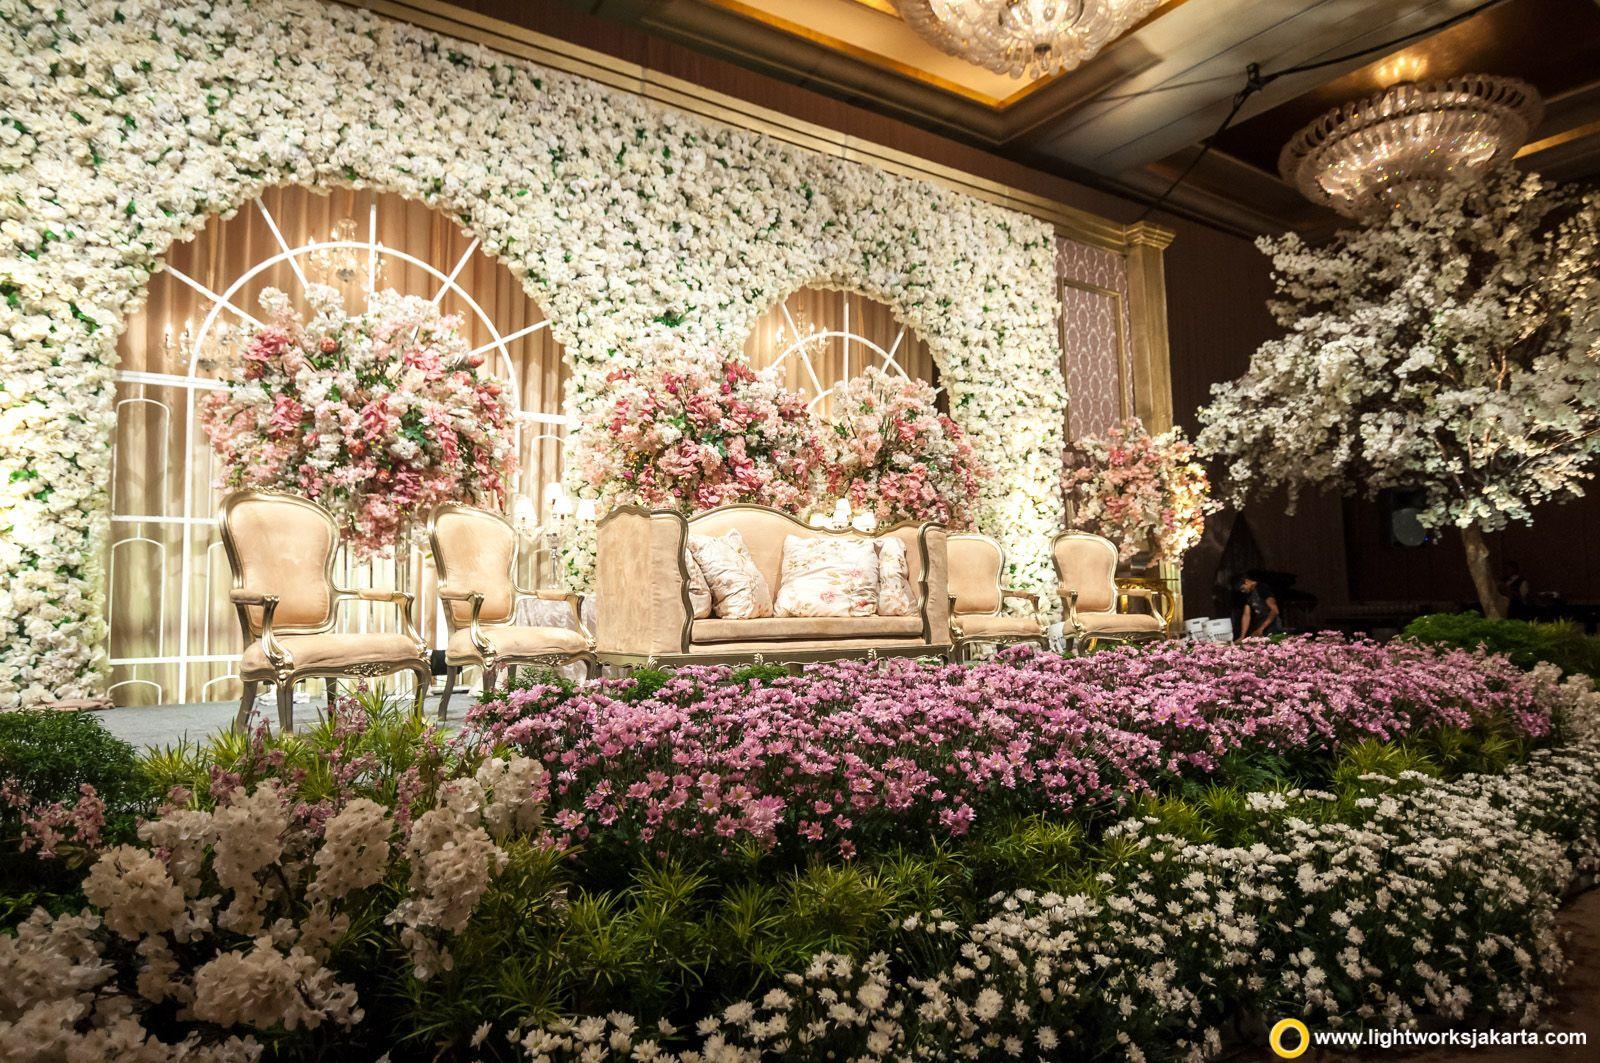 Wedding stage decor ideas  Stunning stage decor  Indian wedding decor ideas  Reception decor